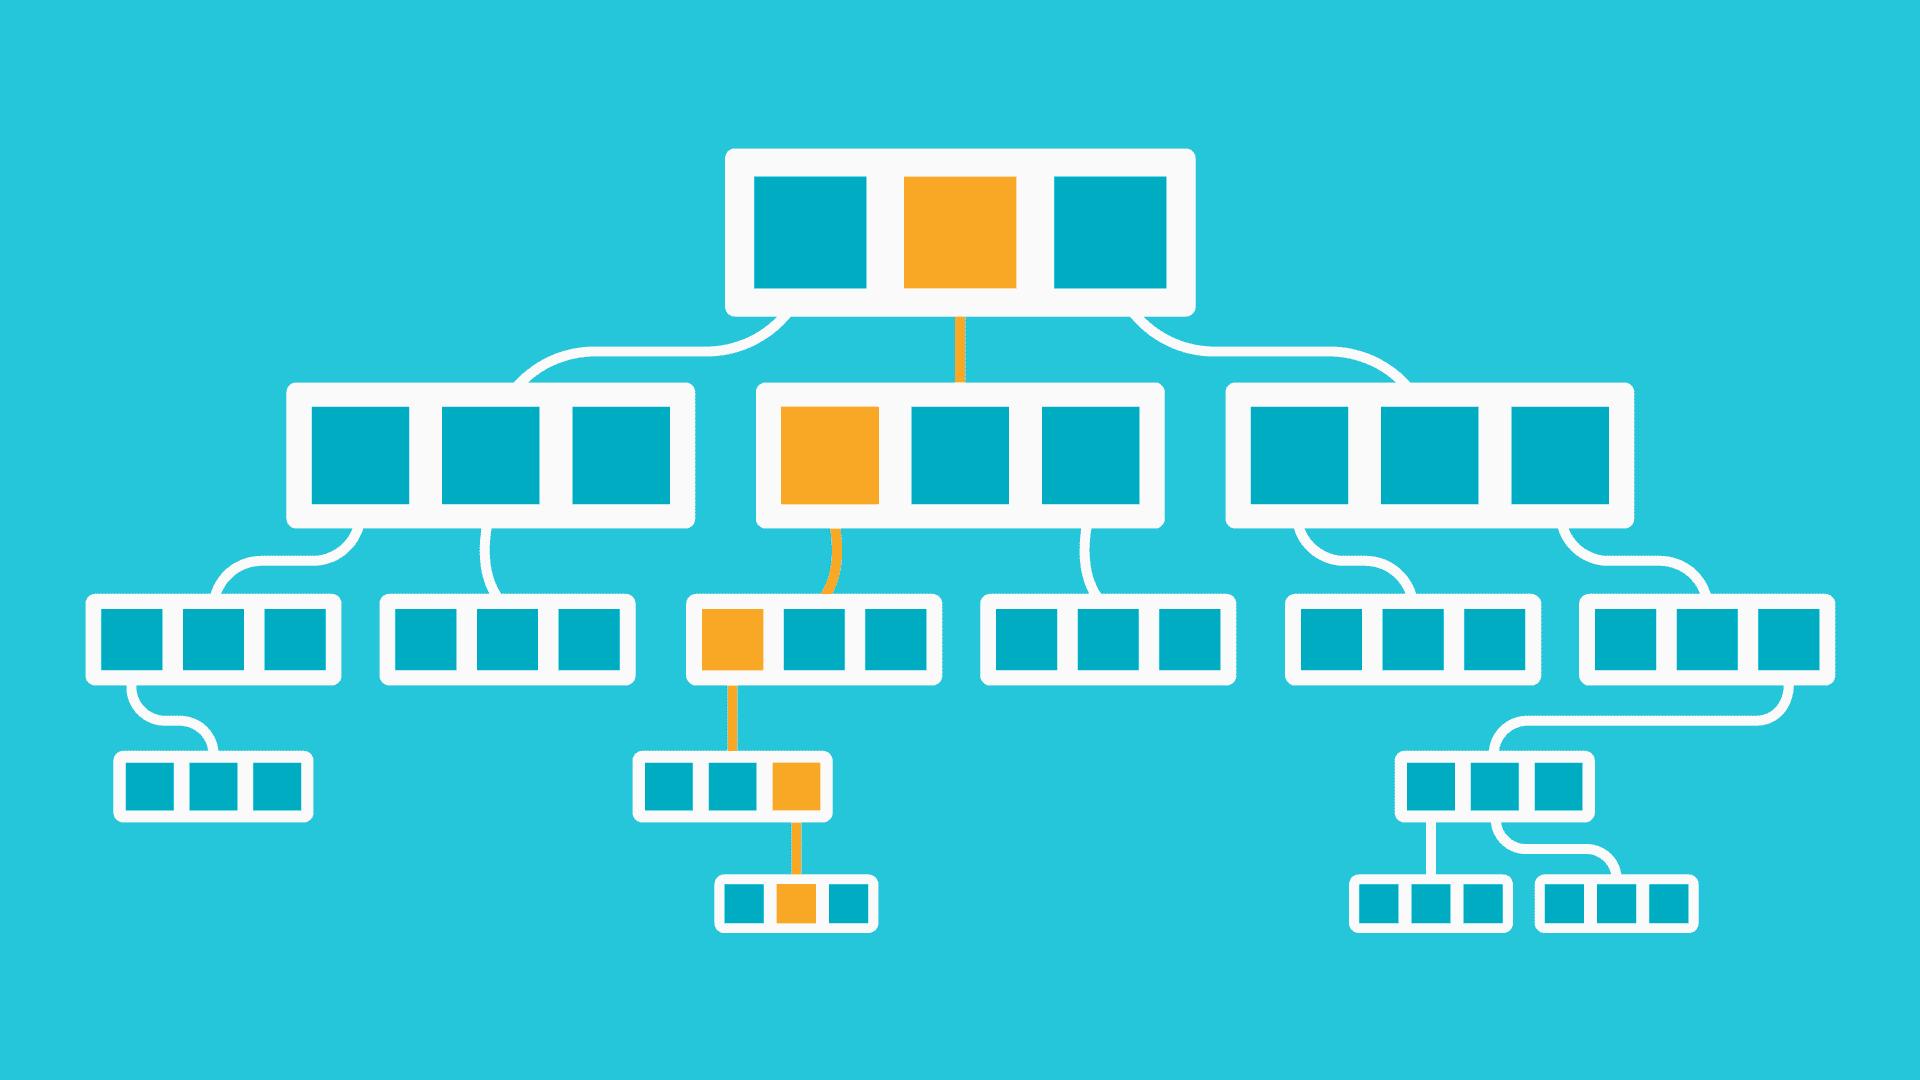 Illustration of data tree querying